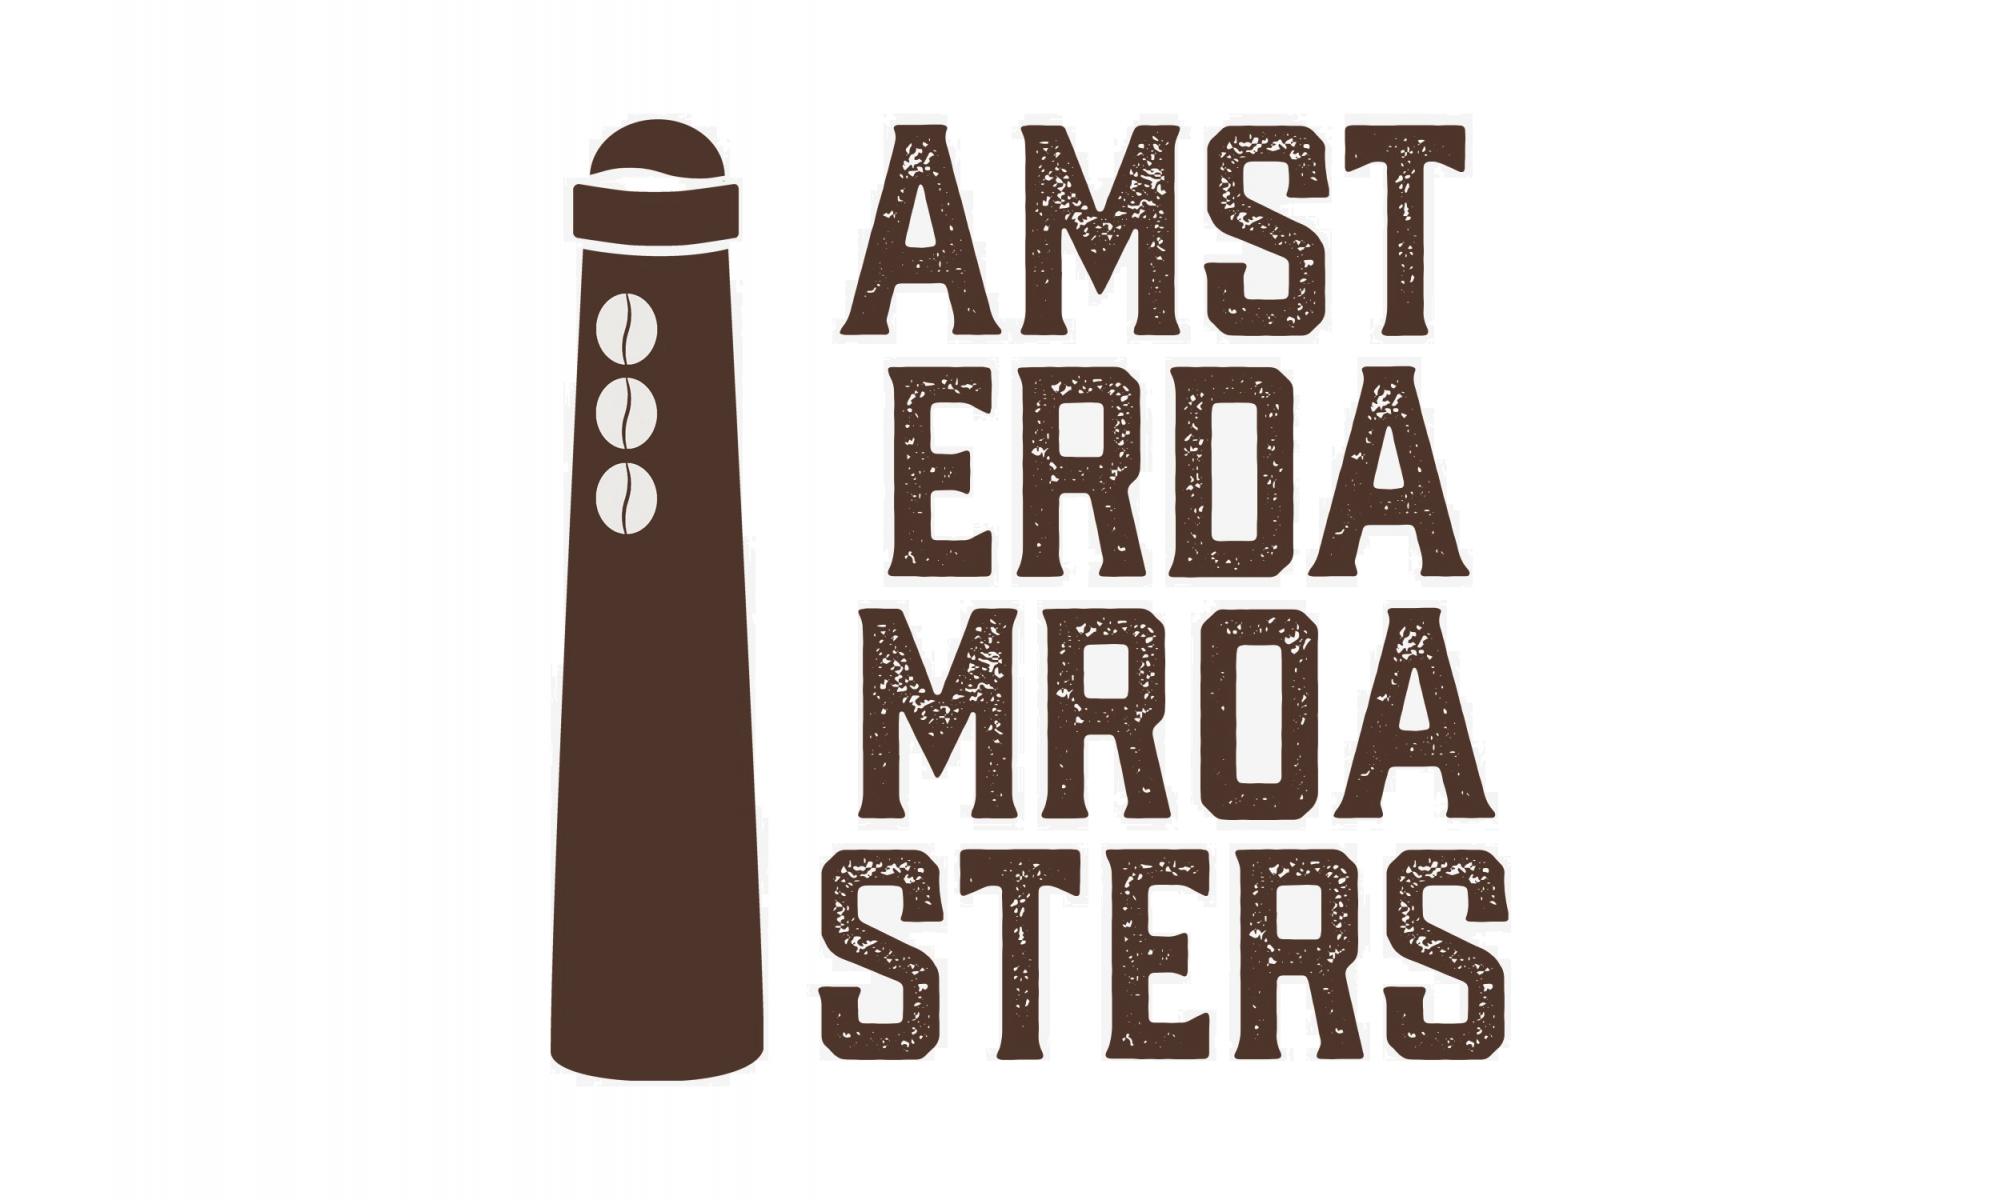 Amsterdam Roasters AR3.0